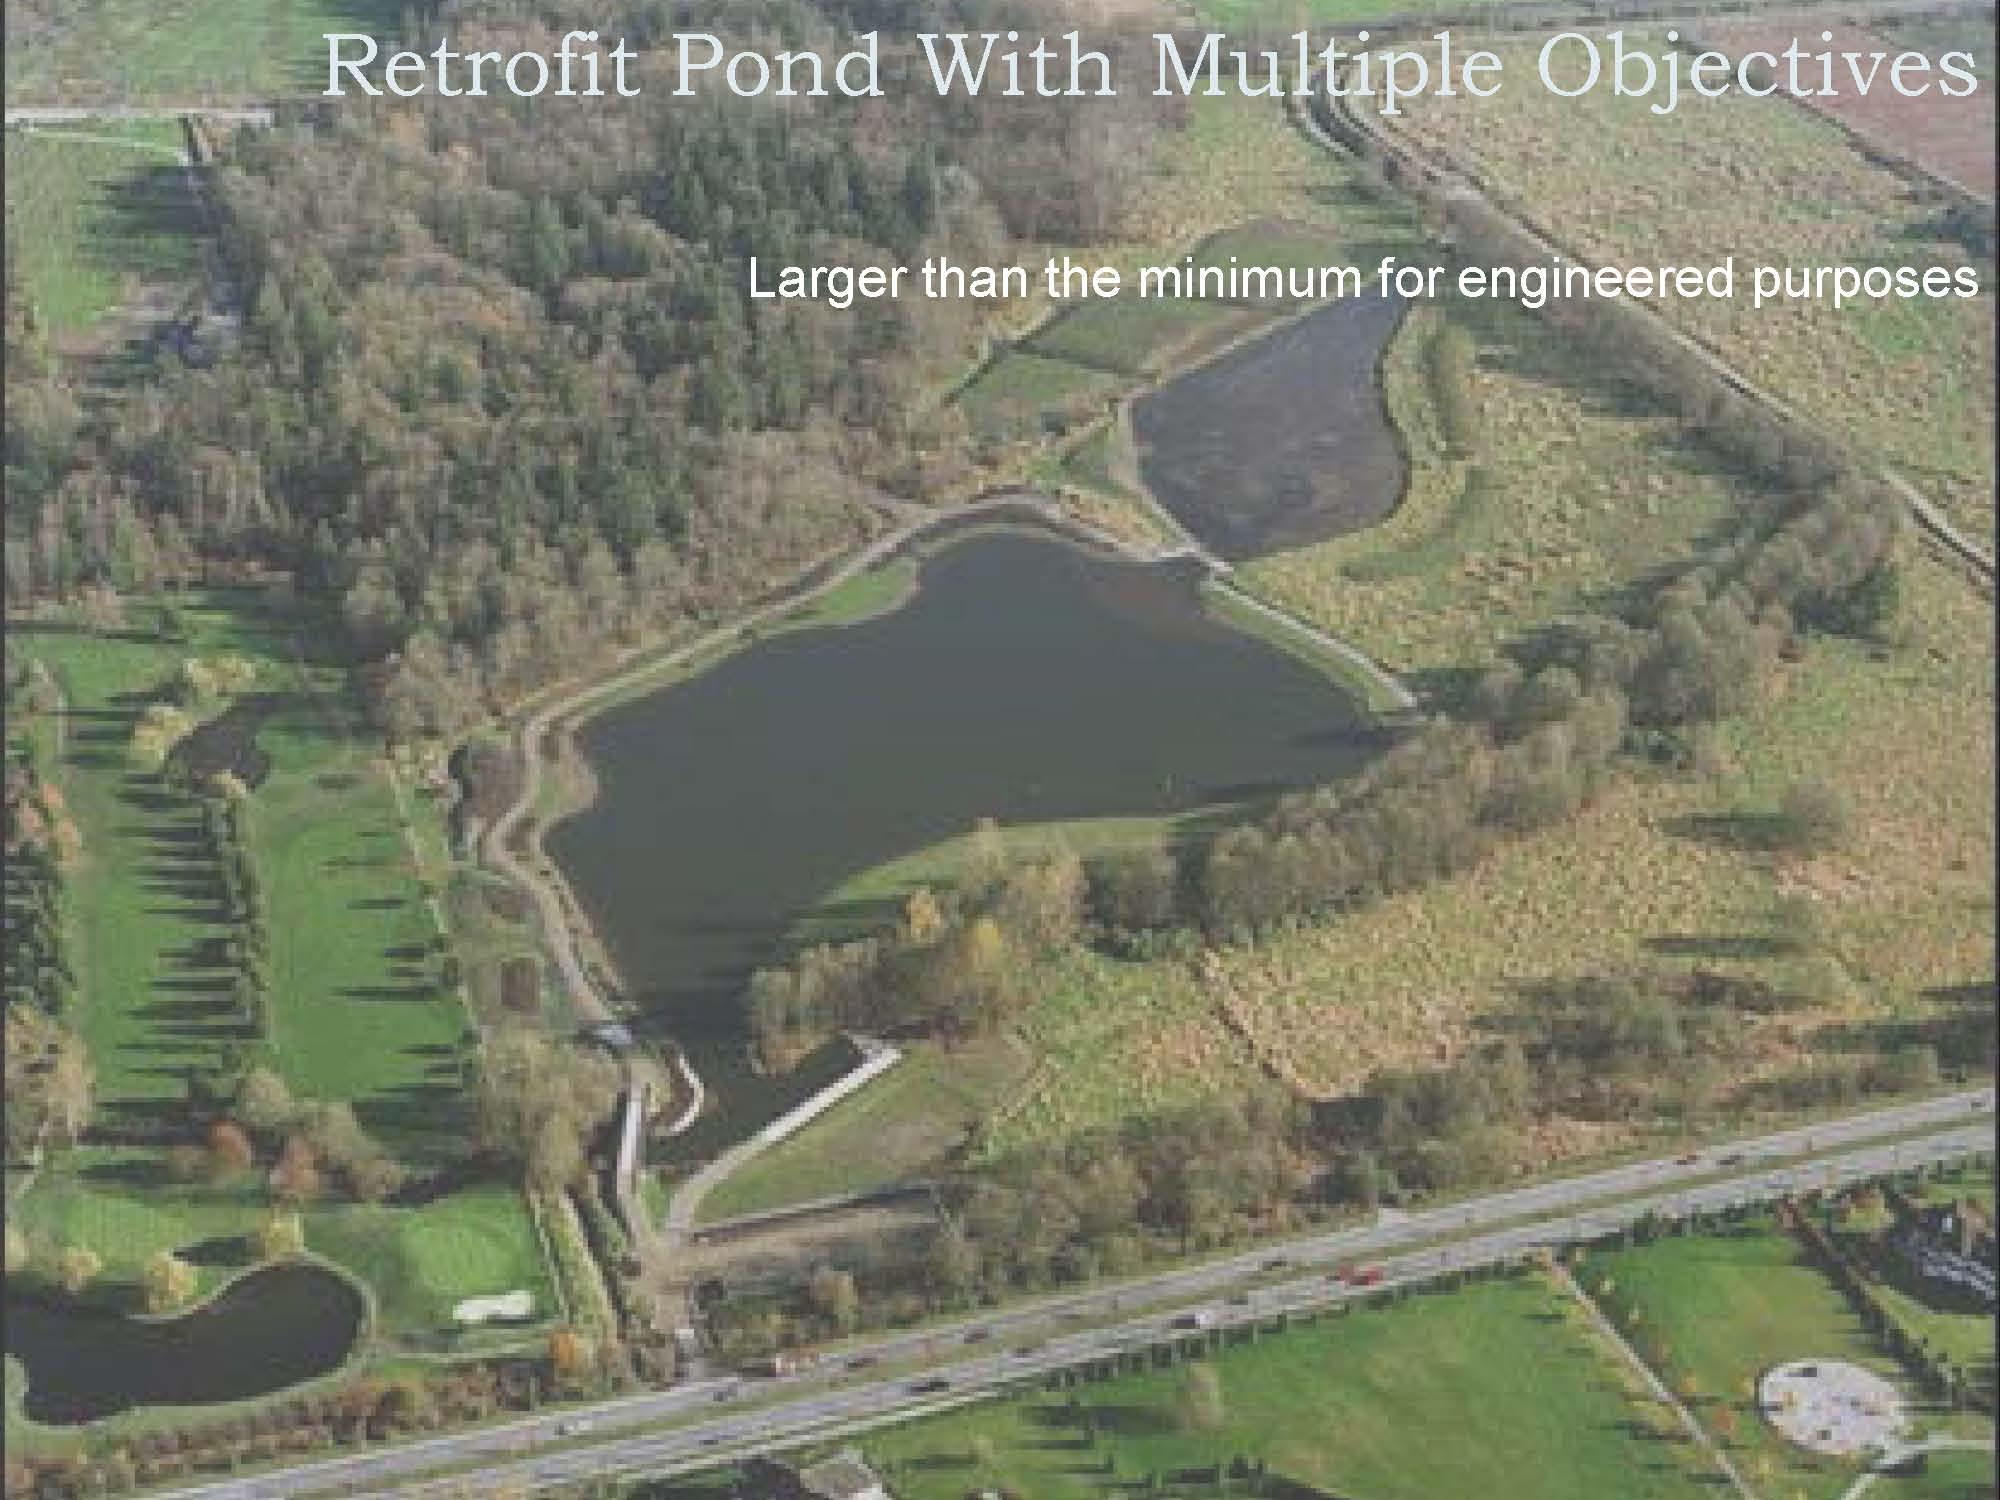 Jim-Dumont_Wetlands-Workshop_Jan2015_multiple objectives